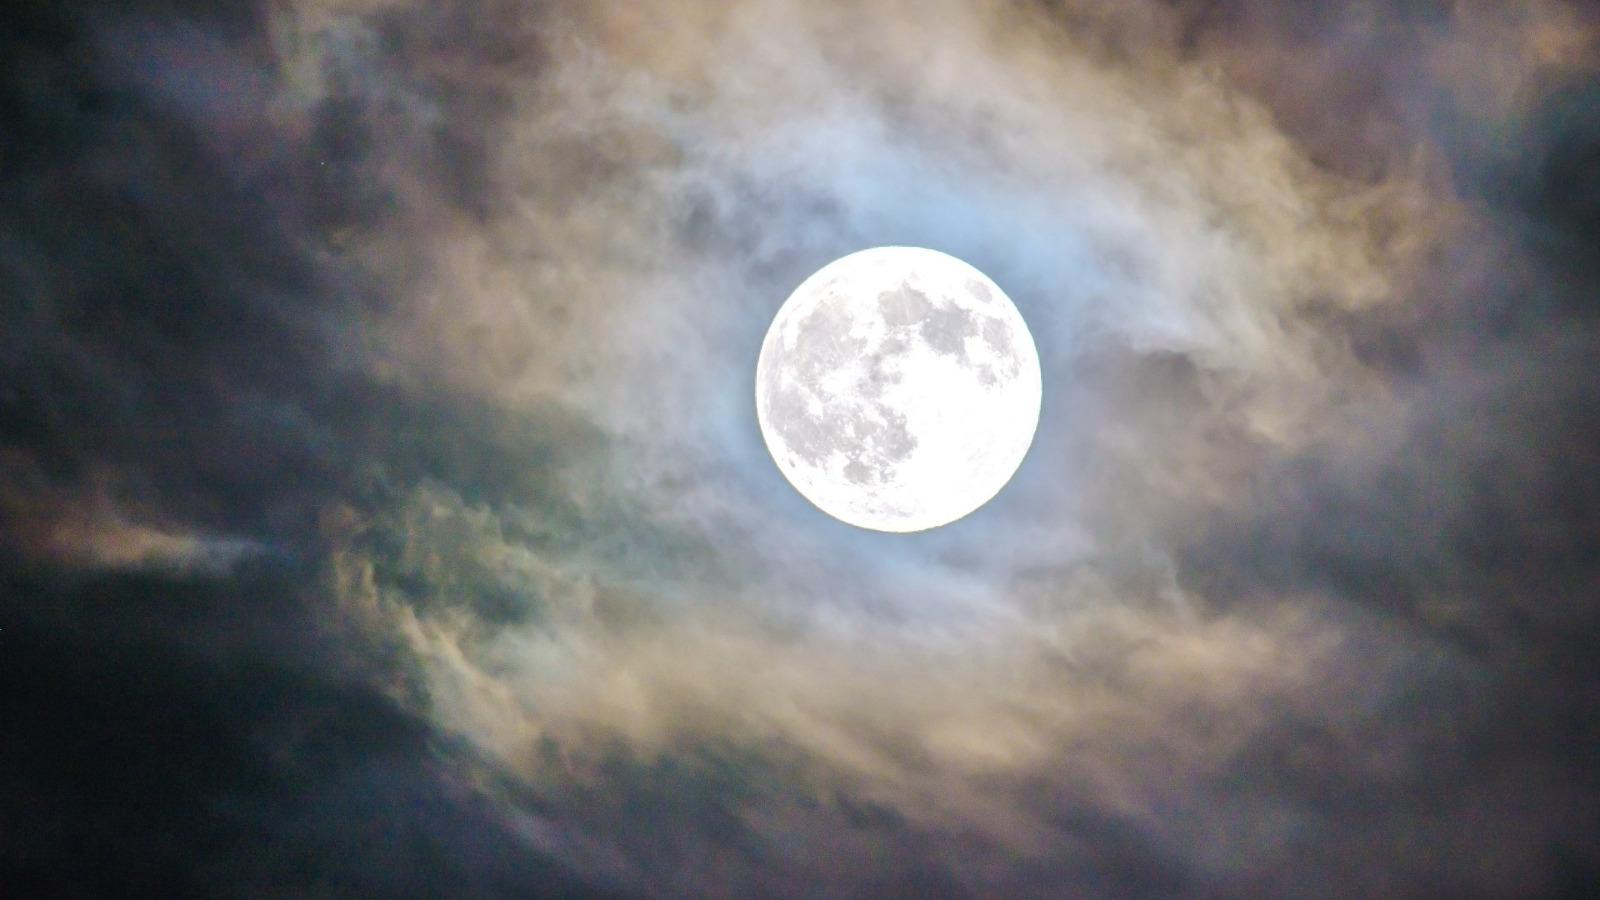 Lunacy, the Full Moon, and Halloween | Anna Elle Liz